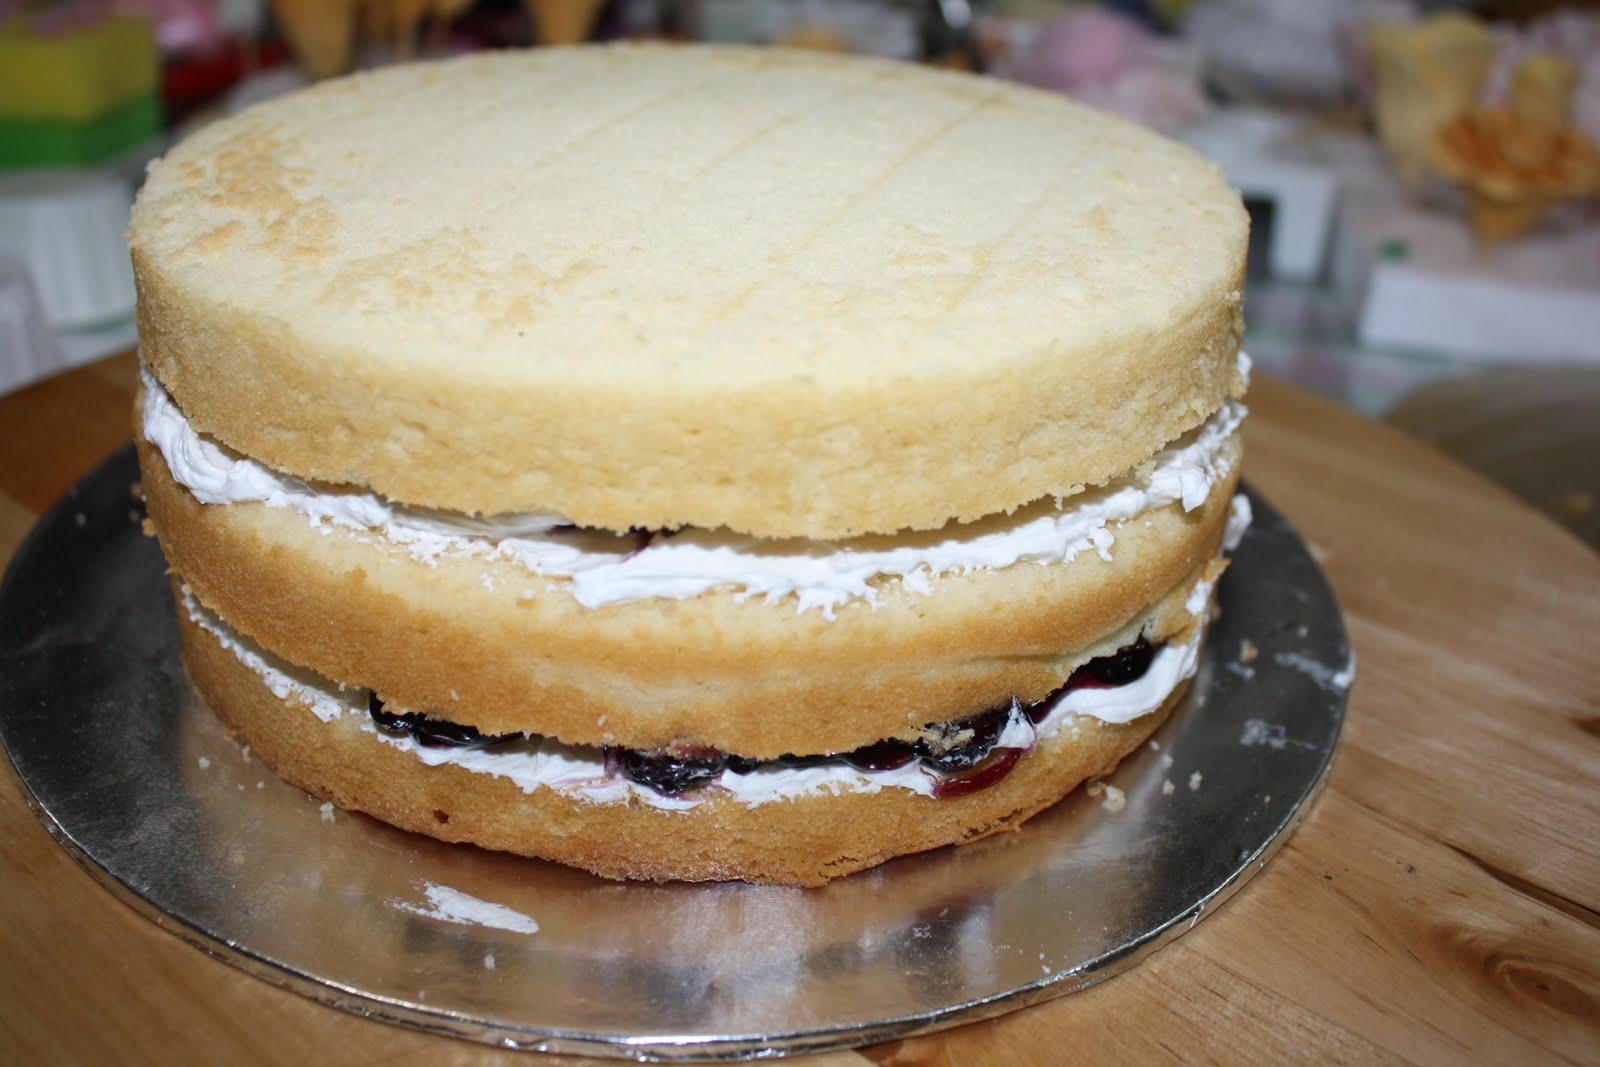 Cake Boss Dirty Icing : cek mek zue: Hanya sebuah senyuman yang menggambarkan....